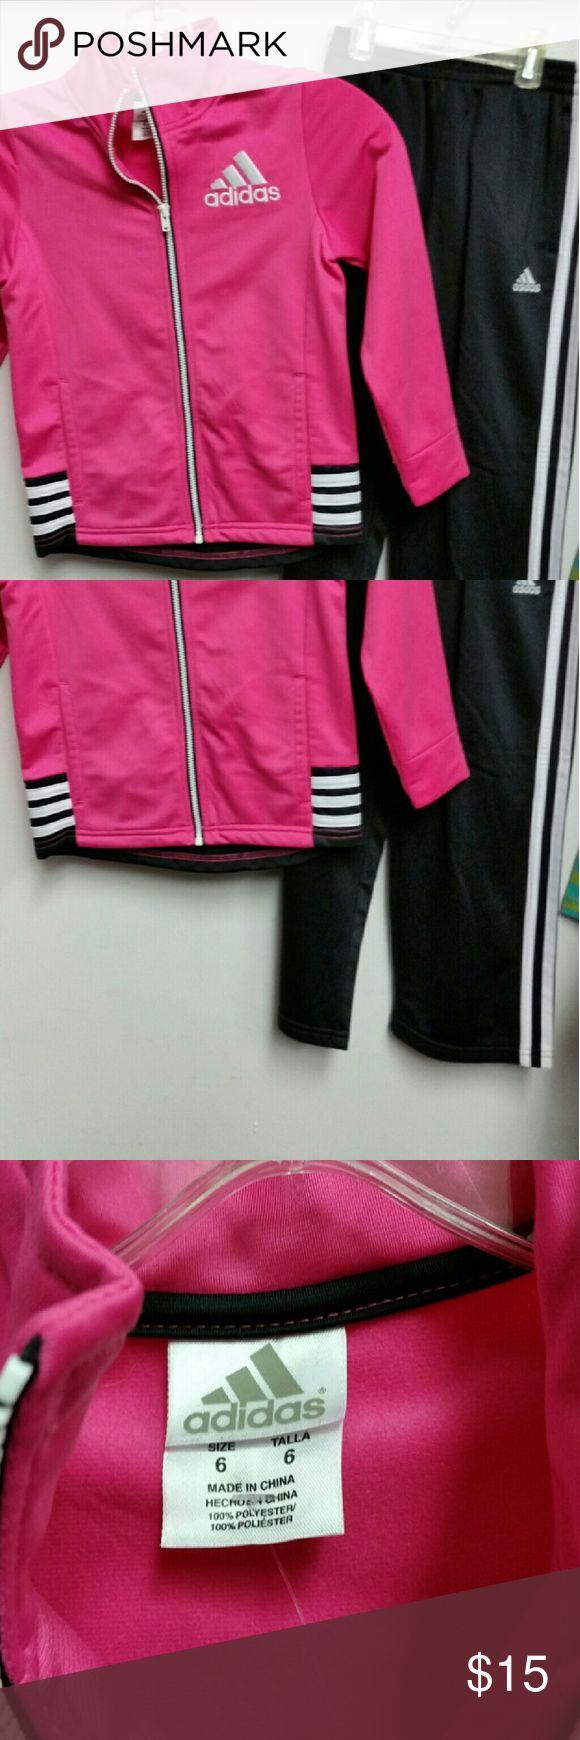 Adidas girls tracksuit vguc sz 6 Pink zip up jacket and black pants stretch waist Adidas Matching Sets